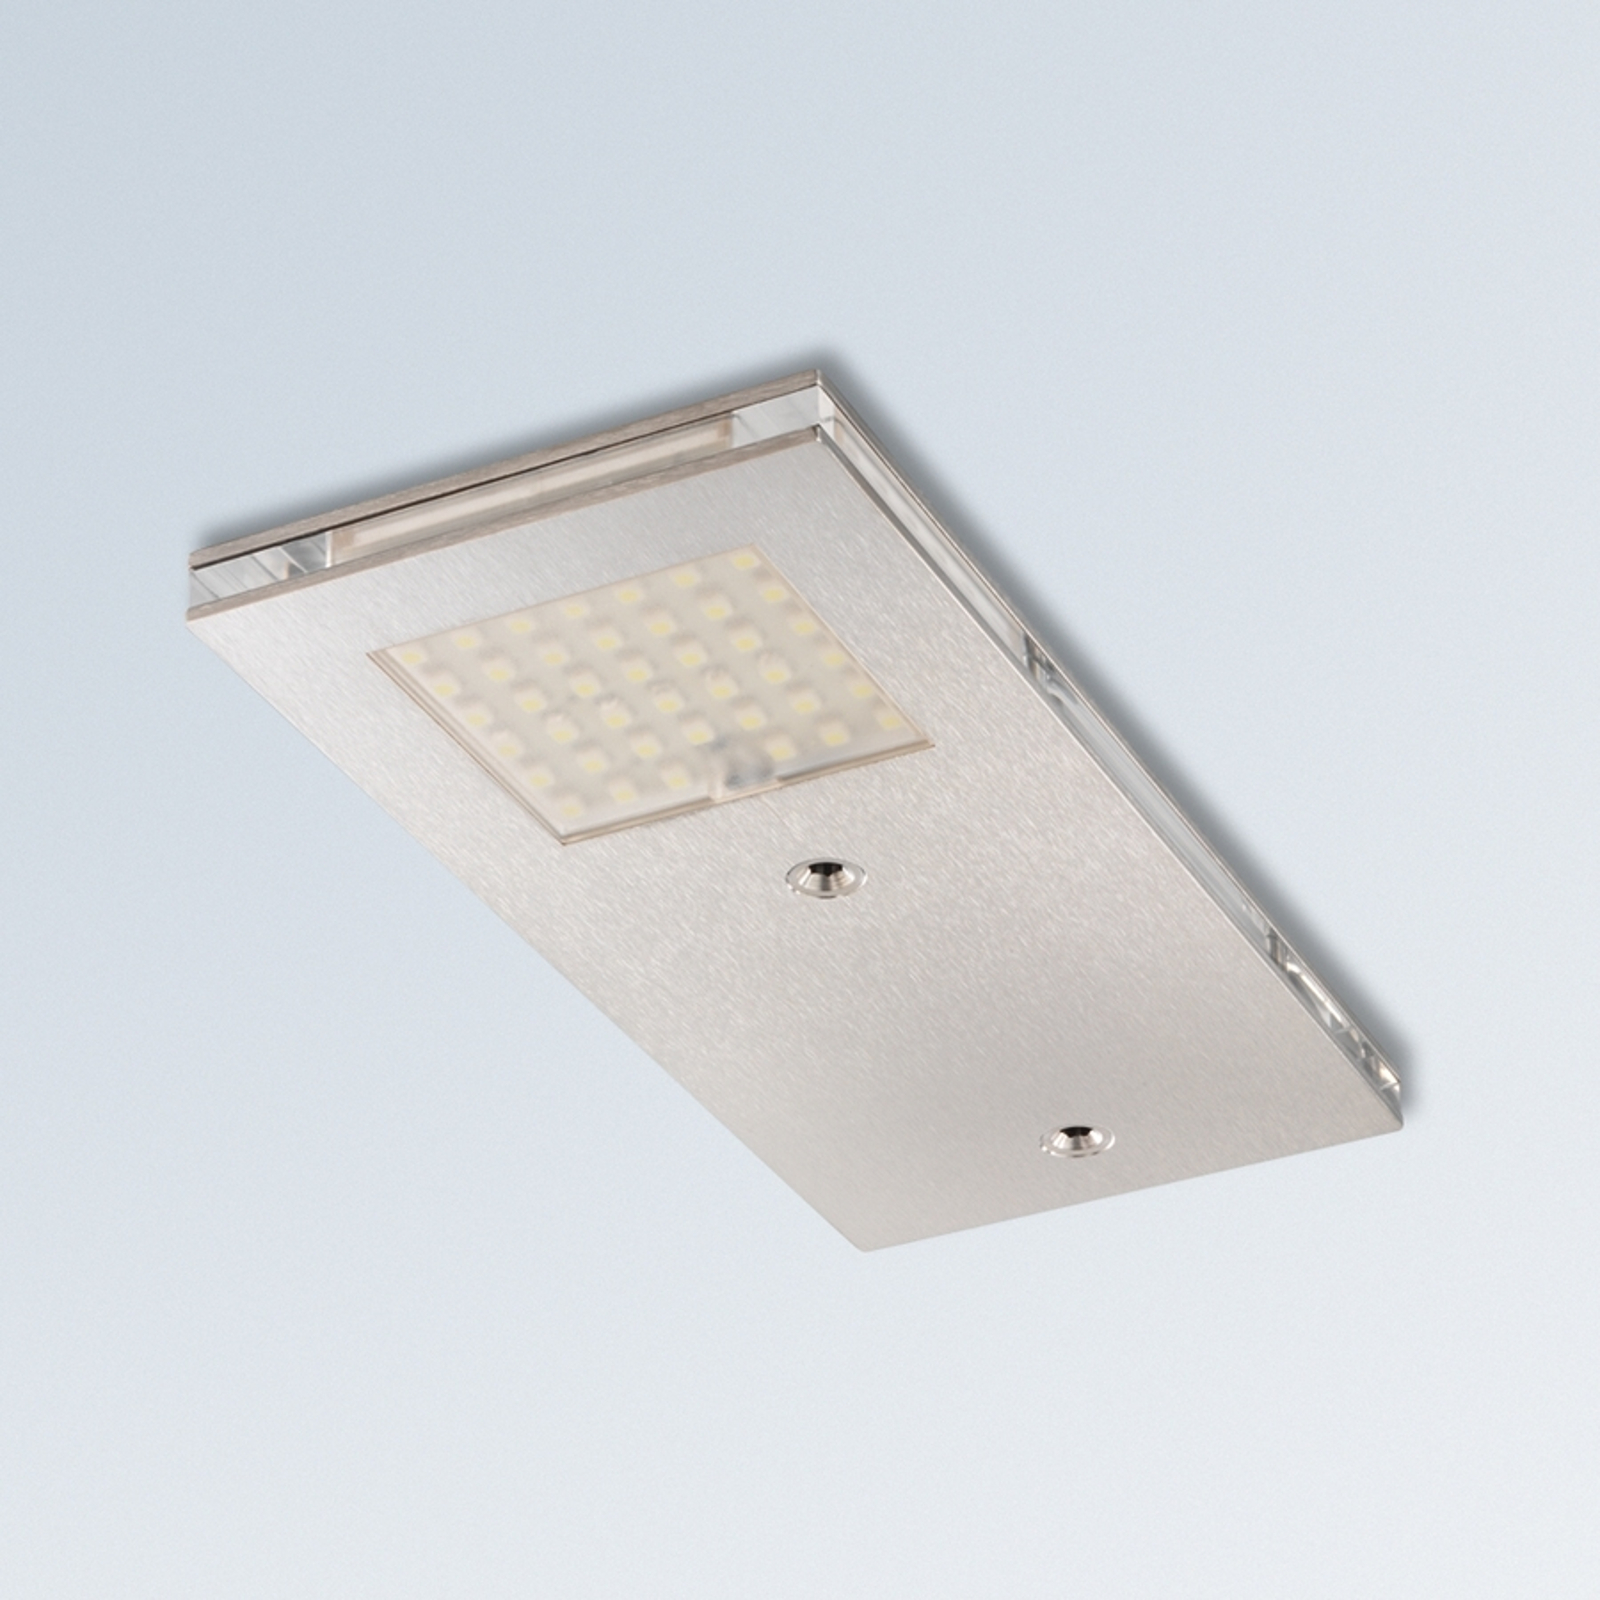 Moderna lampada LED da incasso Flat I